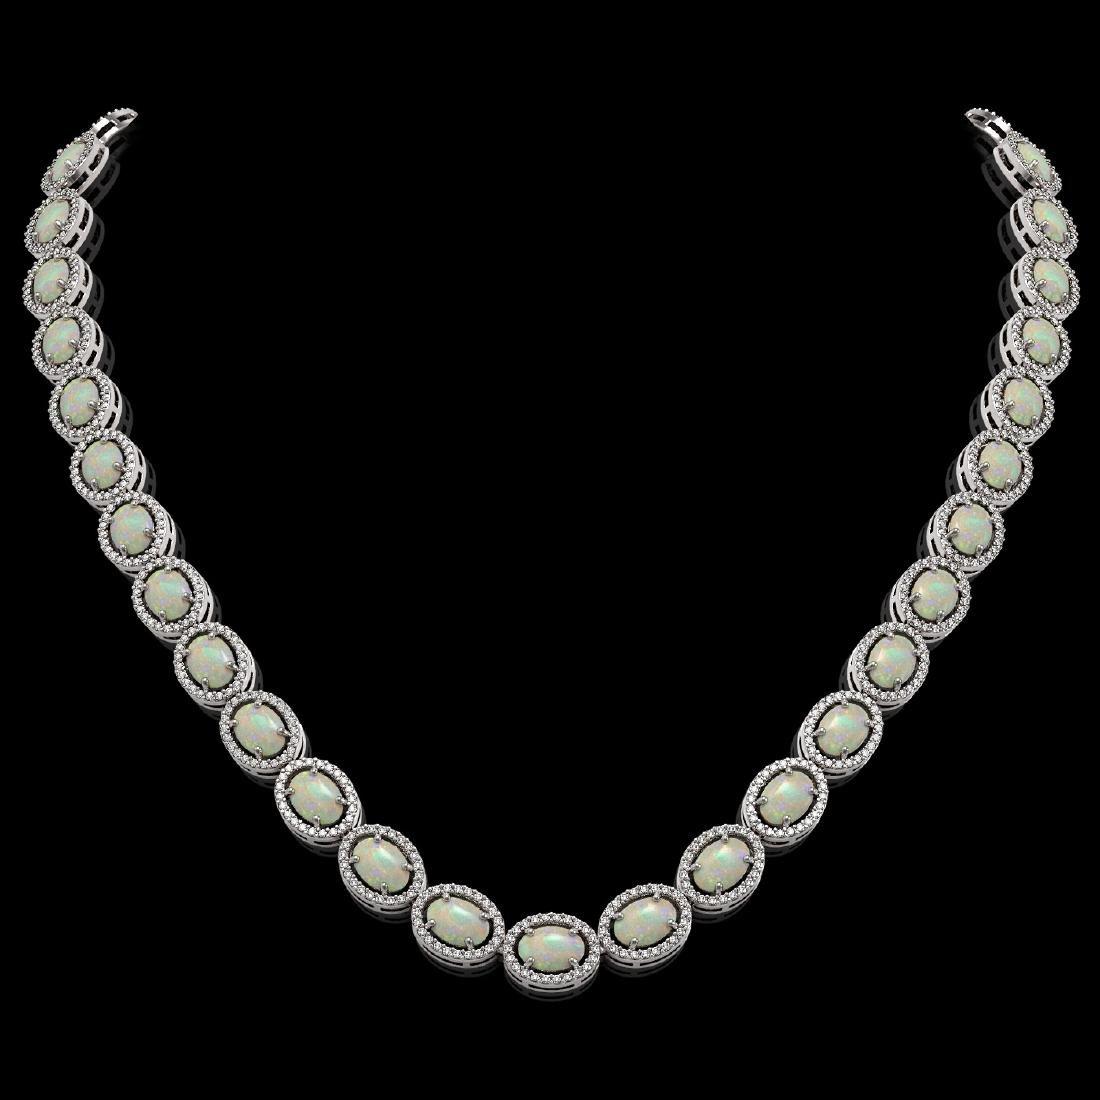 32.42 CTW Opal & Diamond Halo Necklace 10K White Gold